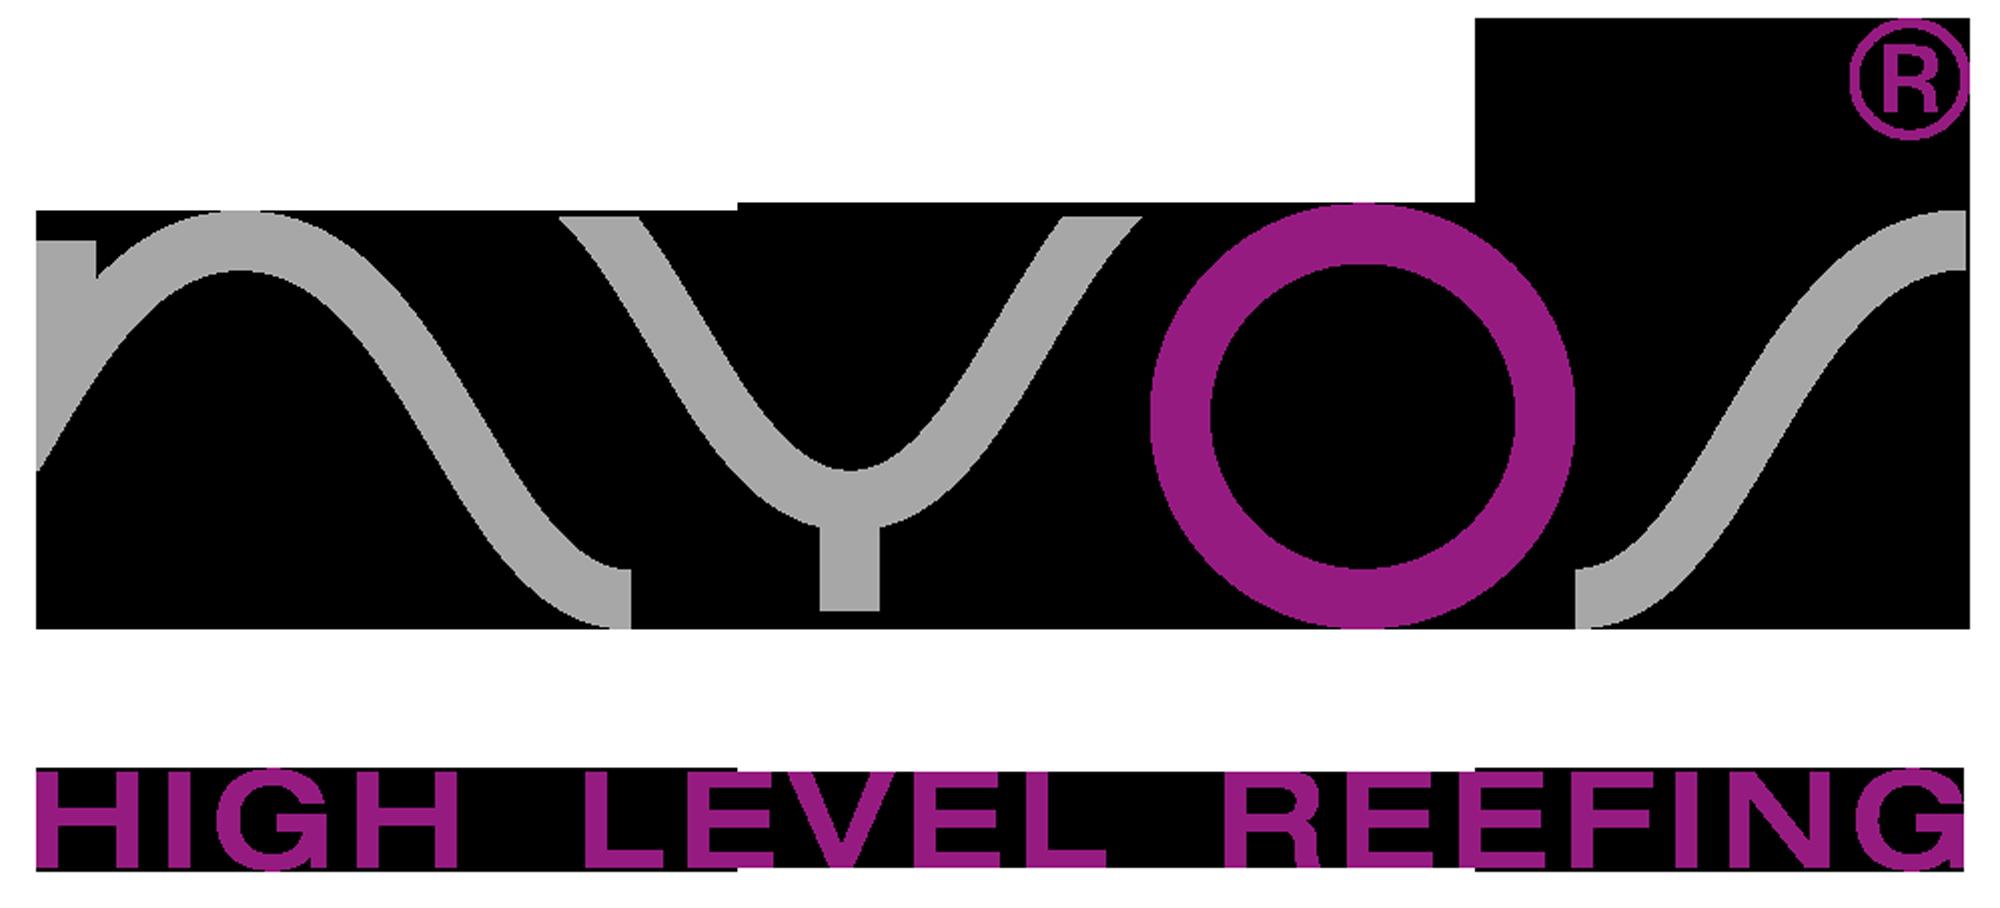 image-577382-NYOS_logo.png